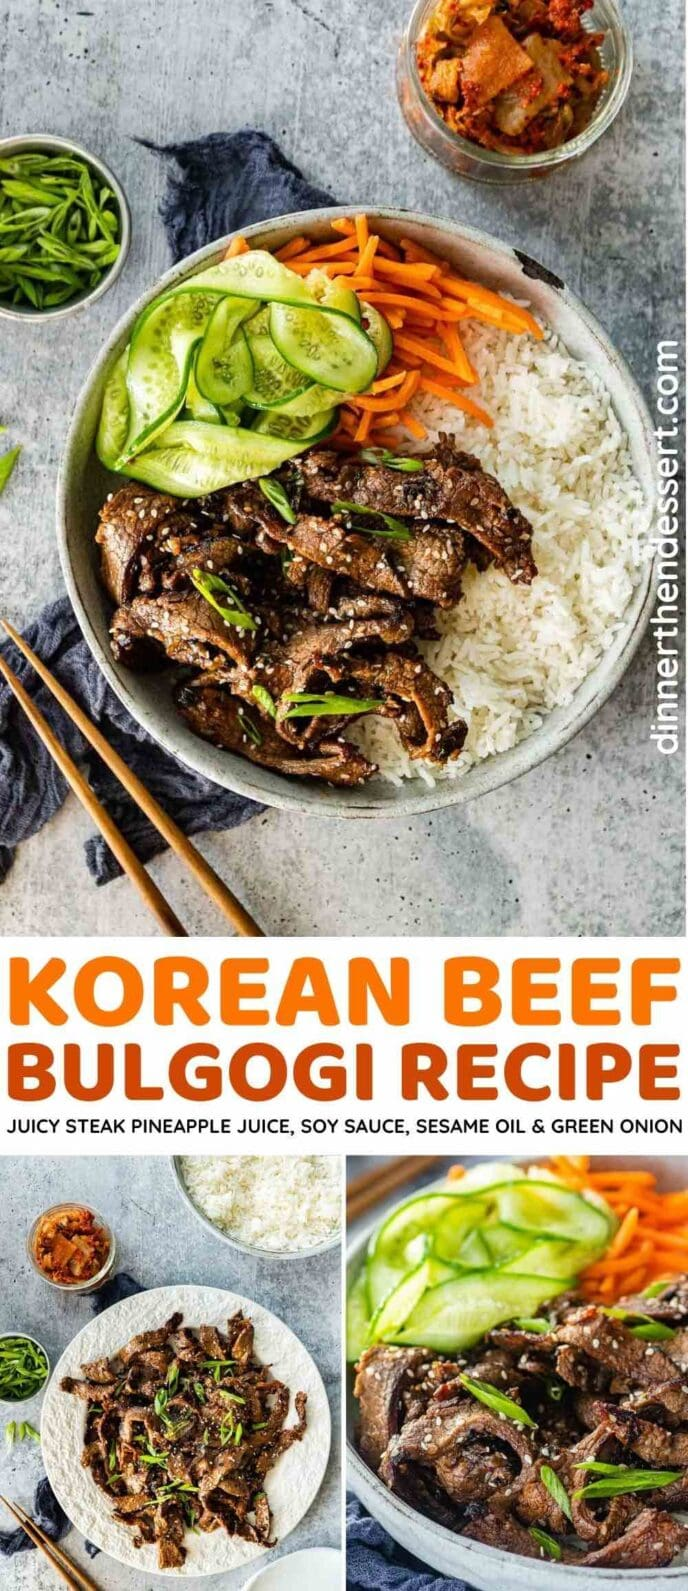 Korean Beef Bulgogi collage